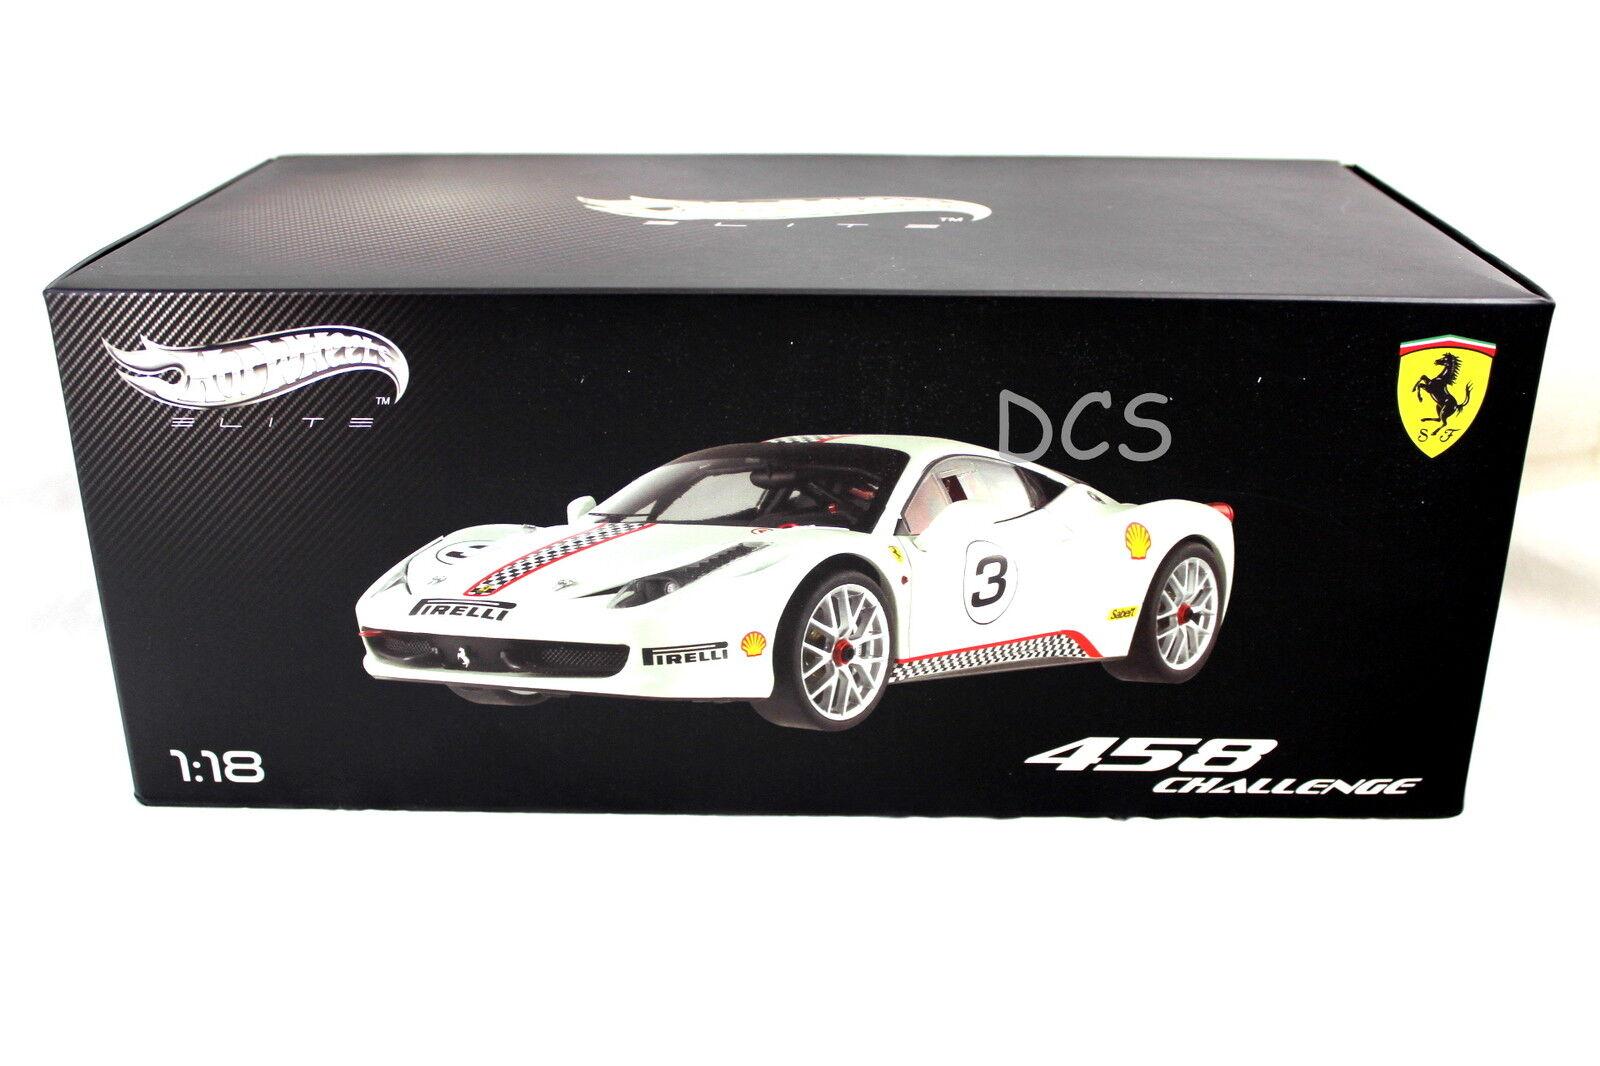 Ferrari 458 italia weiße   herausforderung 3 hot wheels elite 1   18 x5487 druckguss - auto